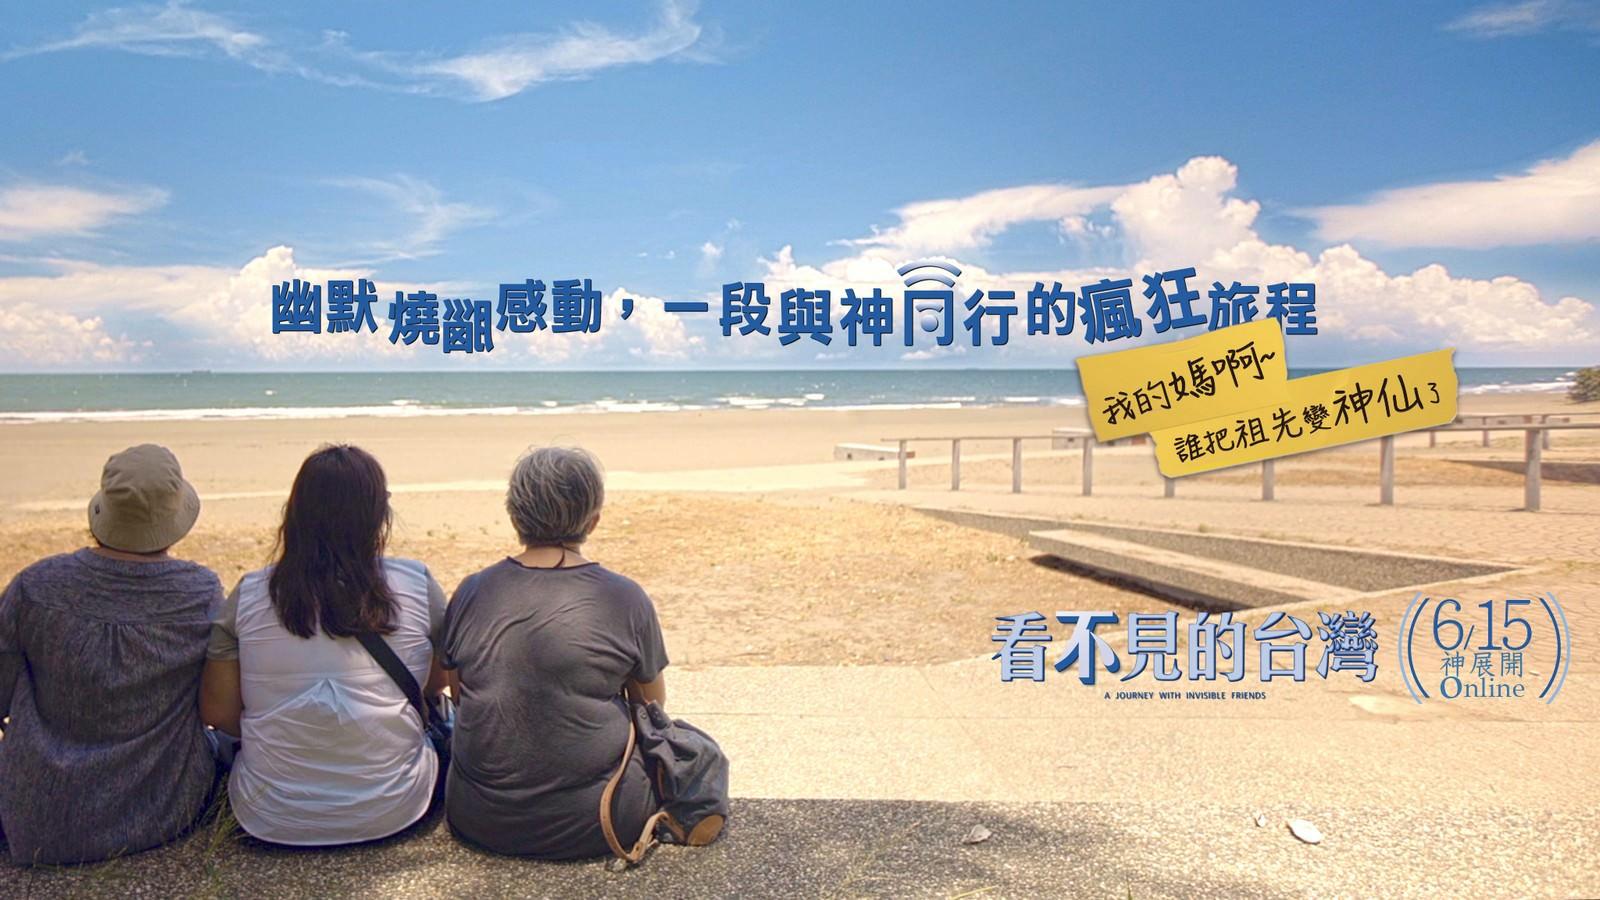 Movie, 看不見的台灣(台灣) / A Journey with Invisible Friends(英文), 電影海報, 台灣, 橫版